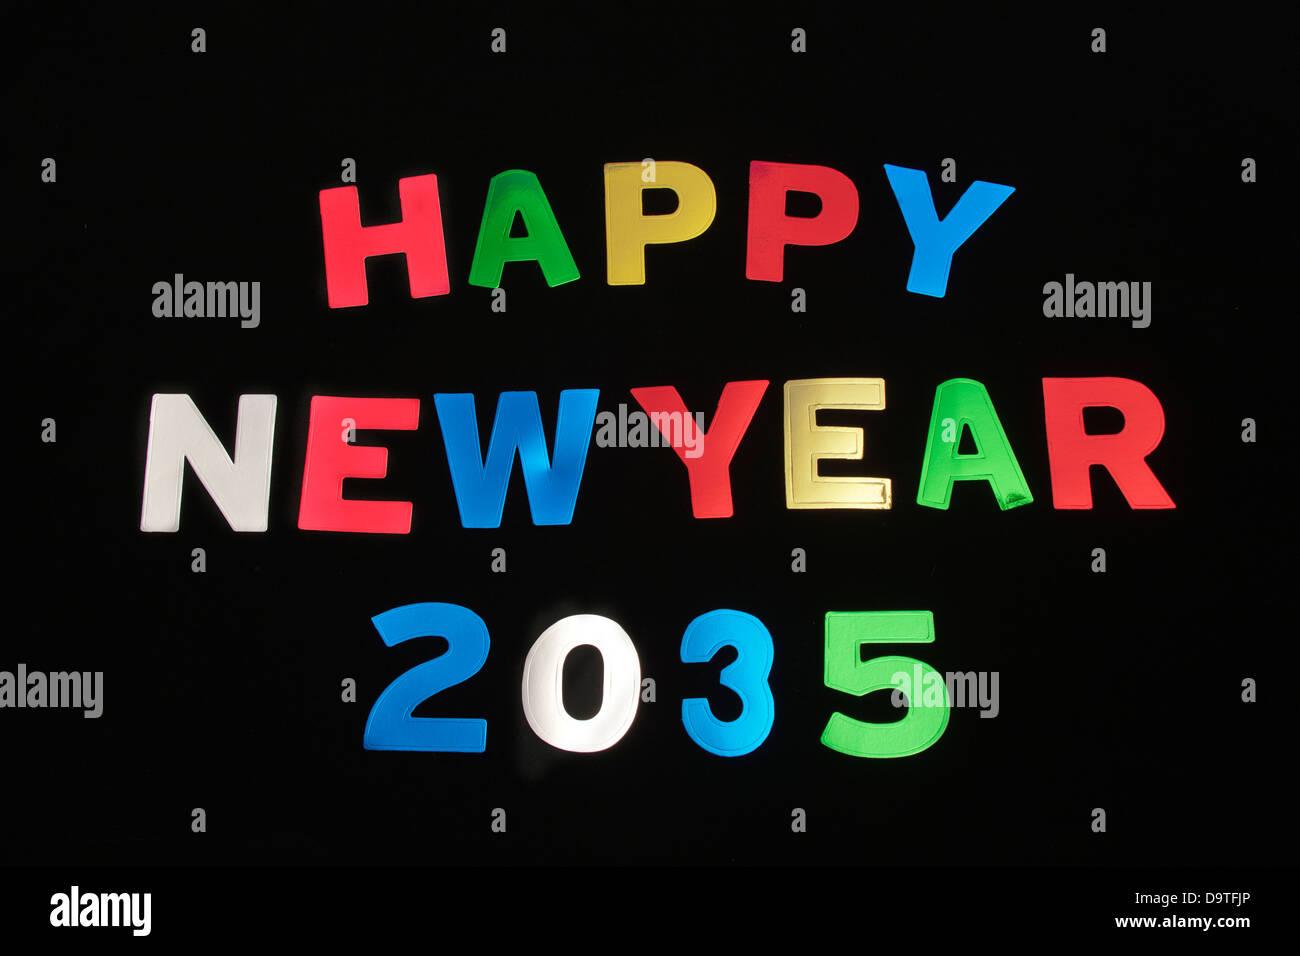 HAPPY NEW YEAR 2035Stock Photo